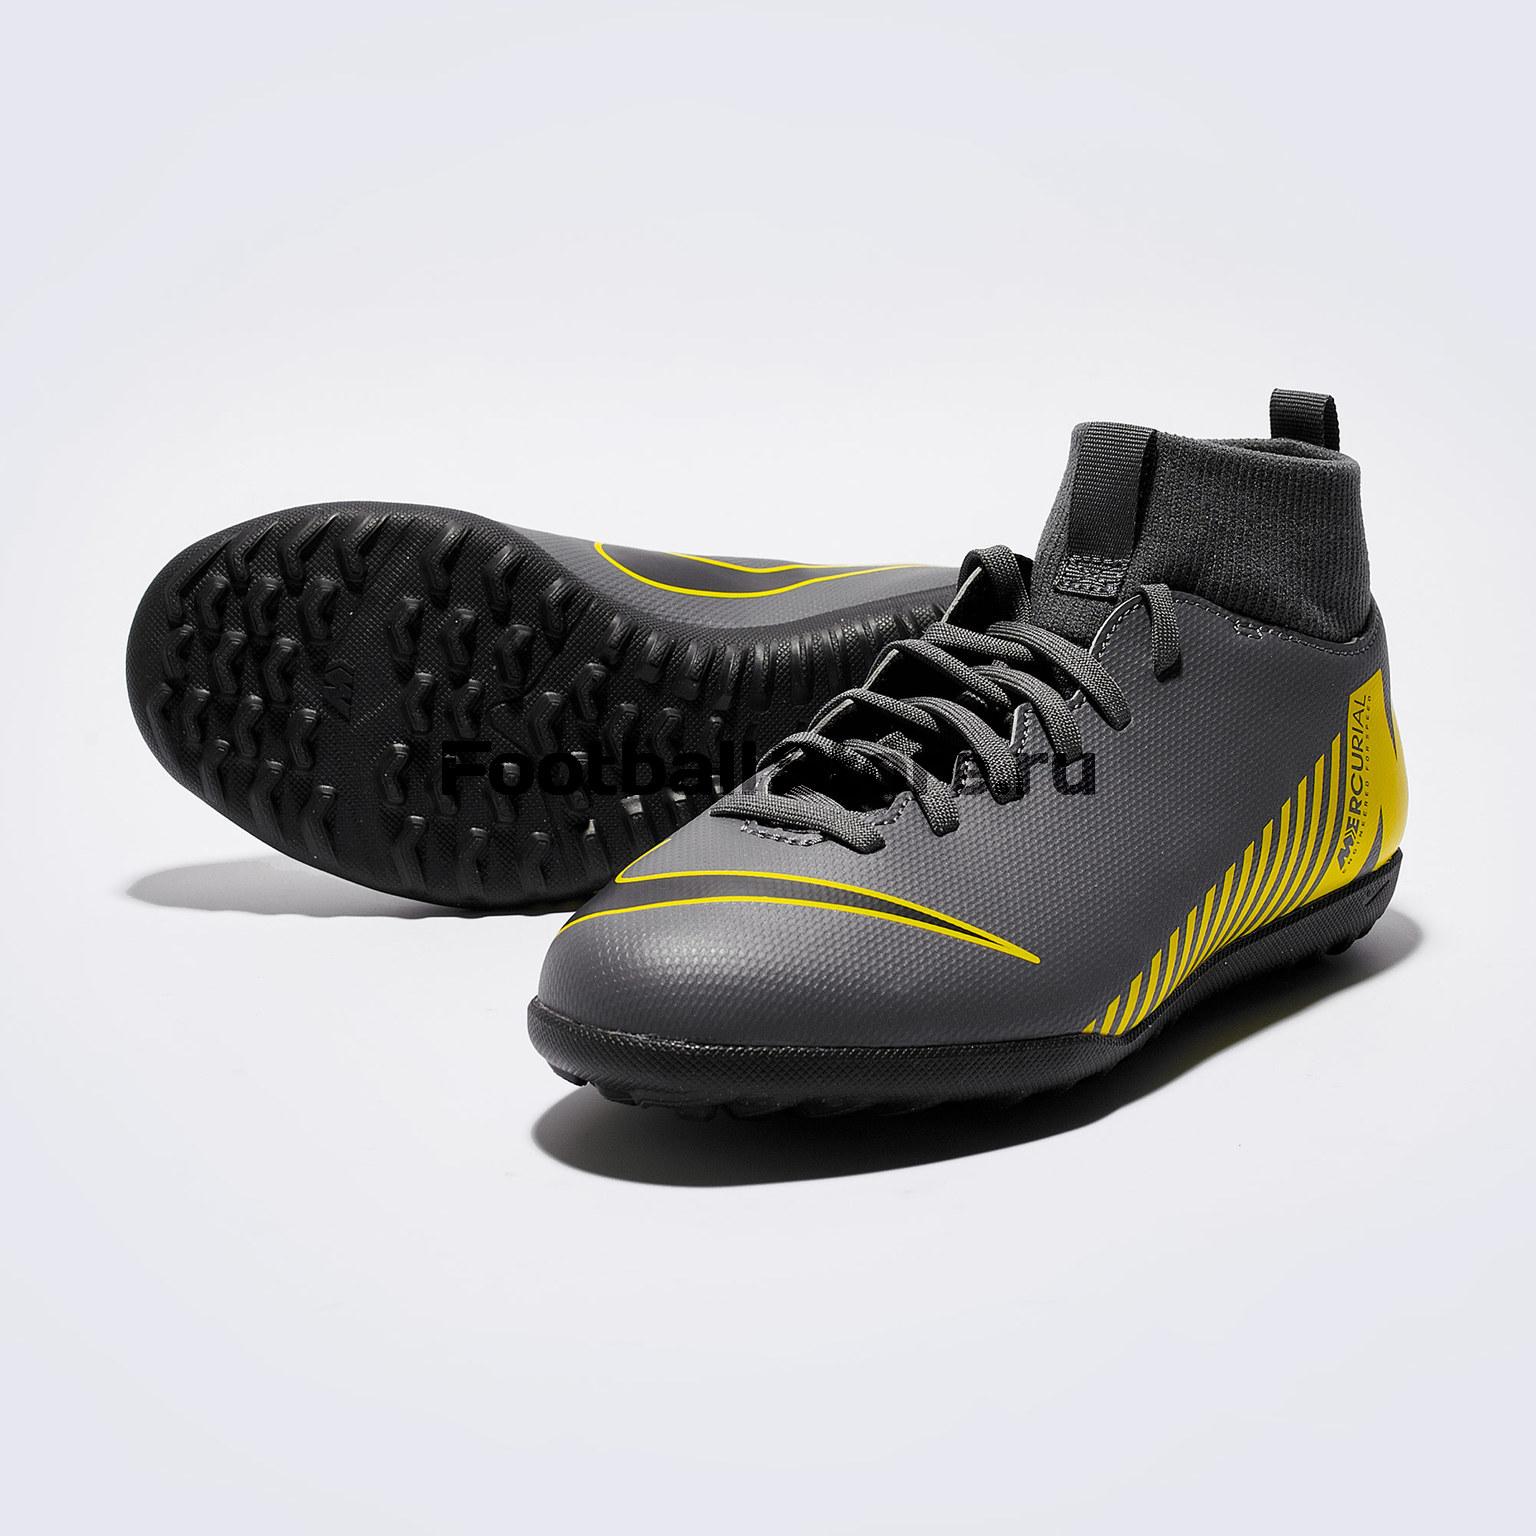 Шиповки детские Nike Superfly 6 Club TF AH7345-070